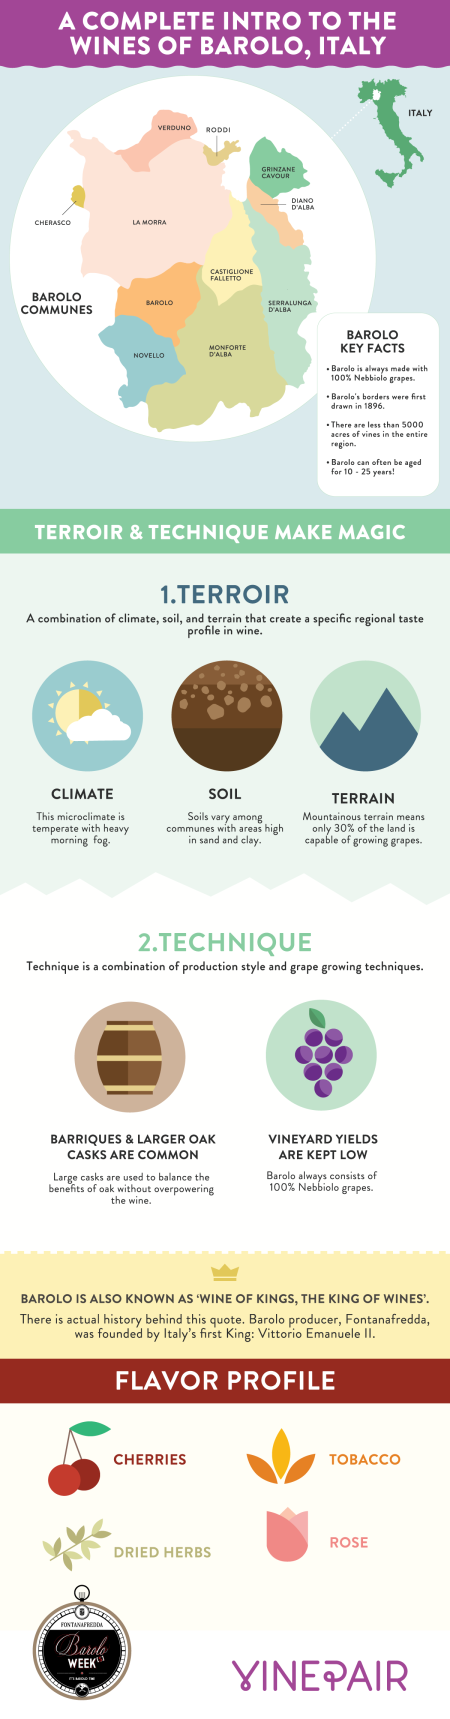 5-barolo-infographic-franklin-liquors